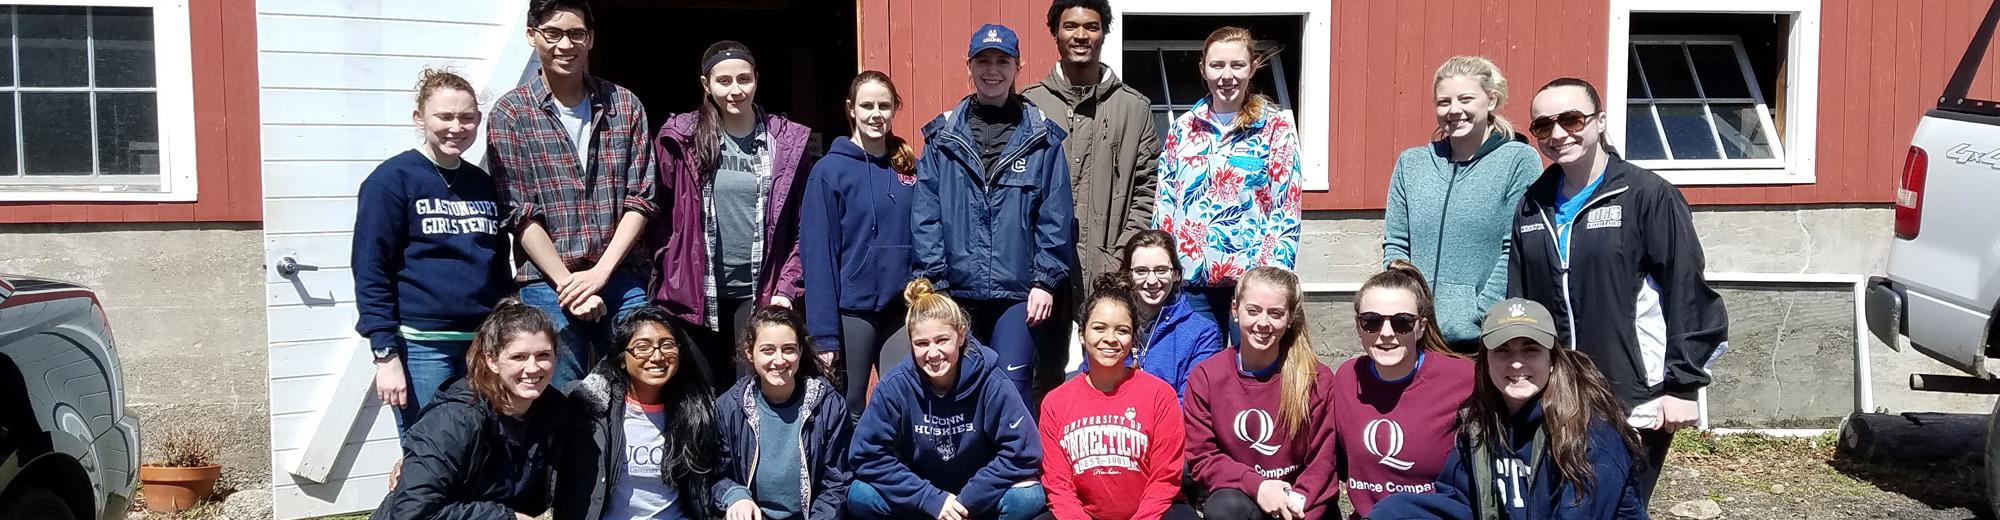 Massaro Farm volunteers